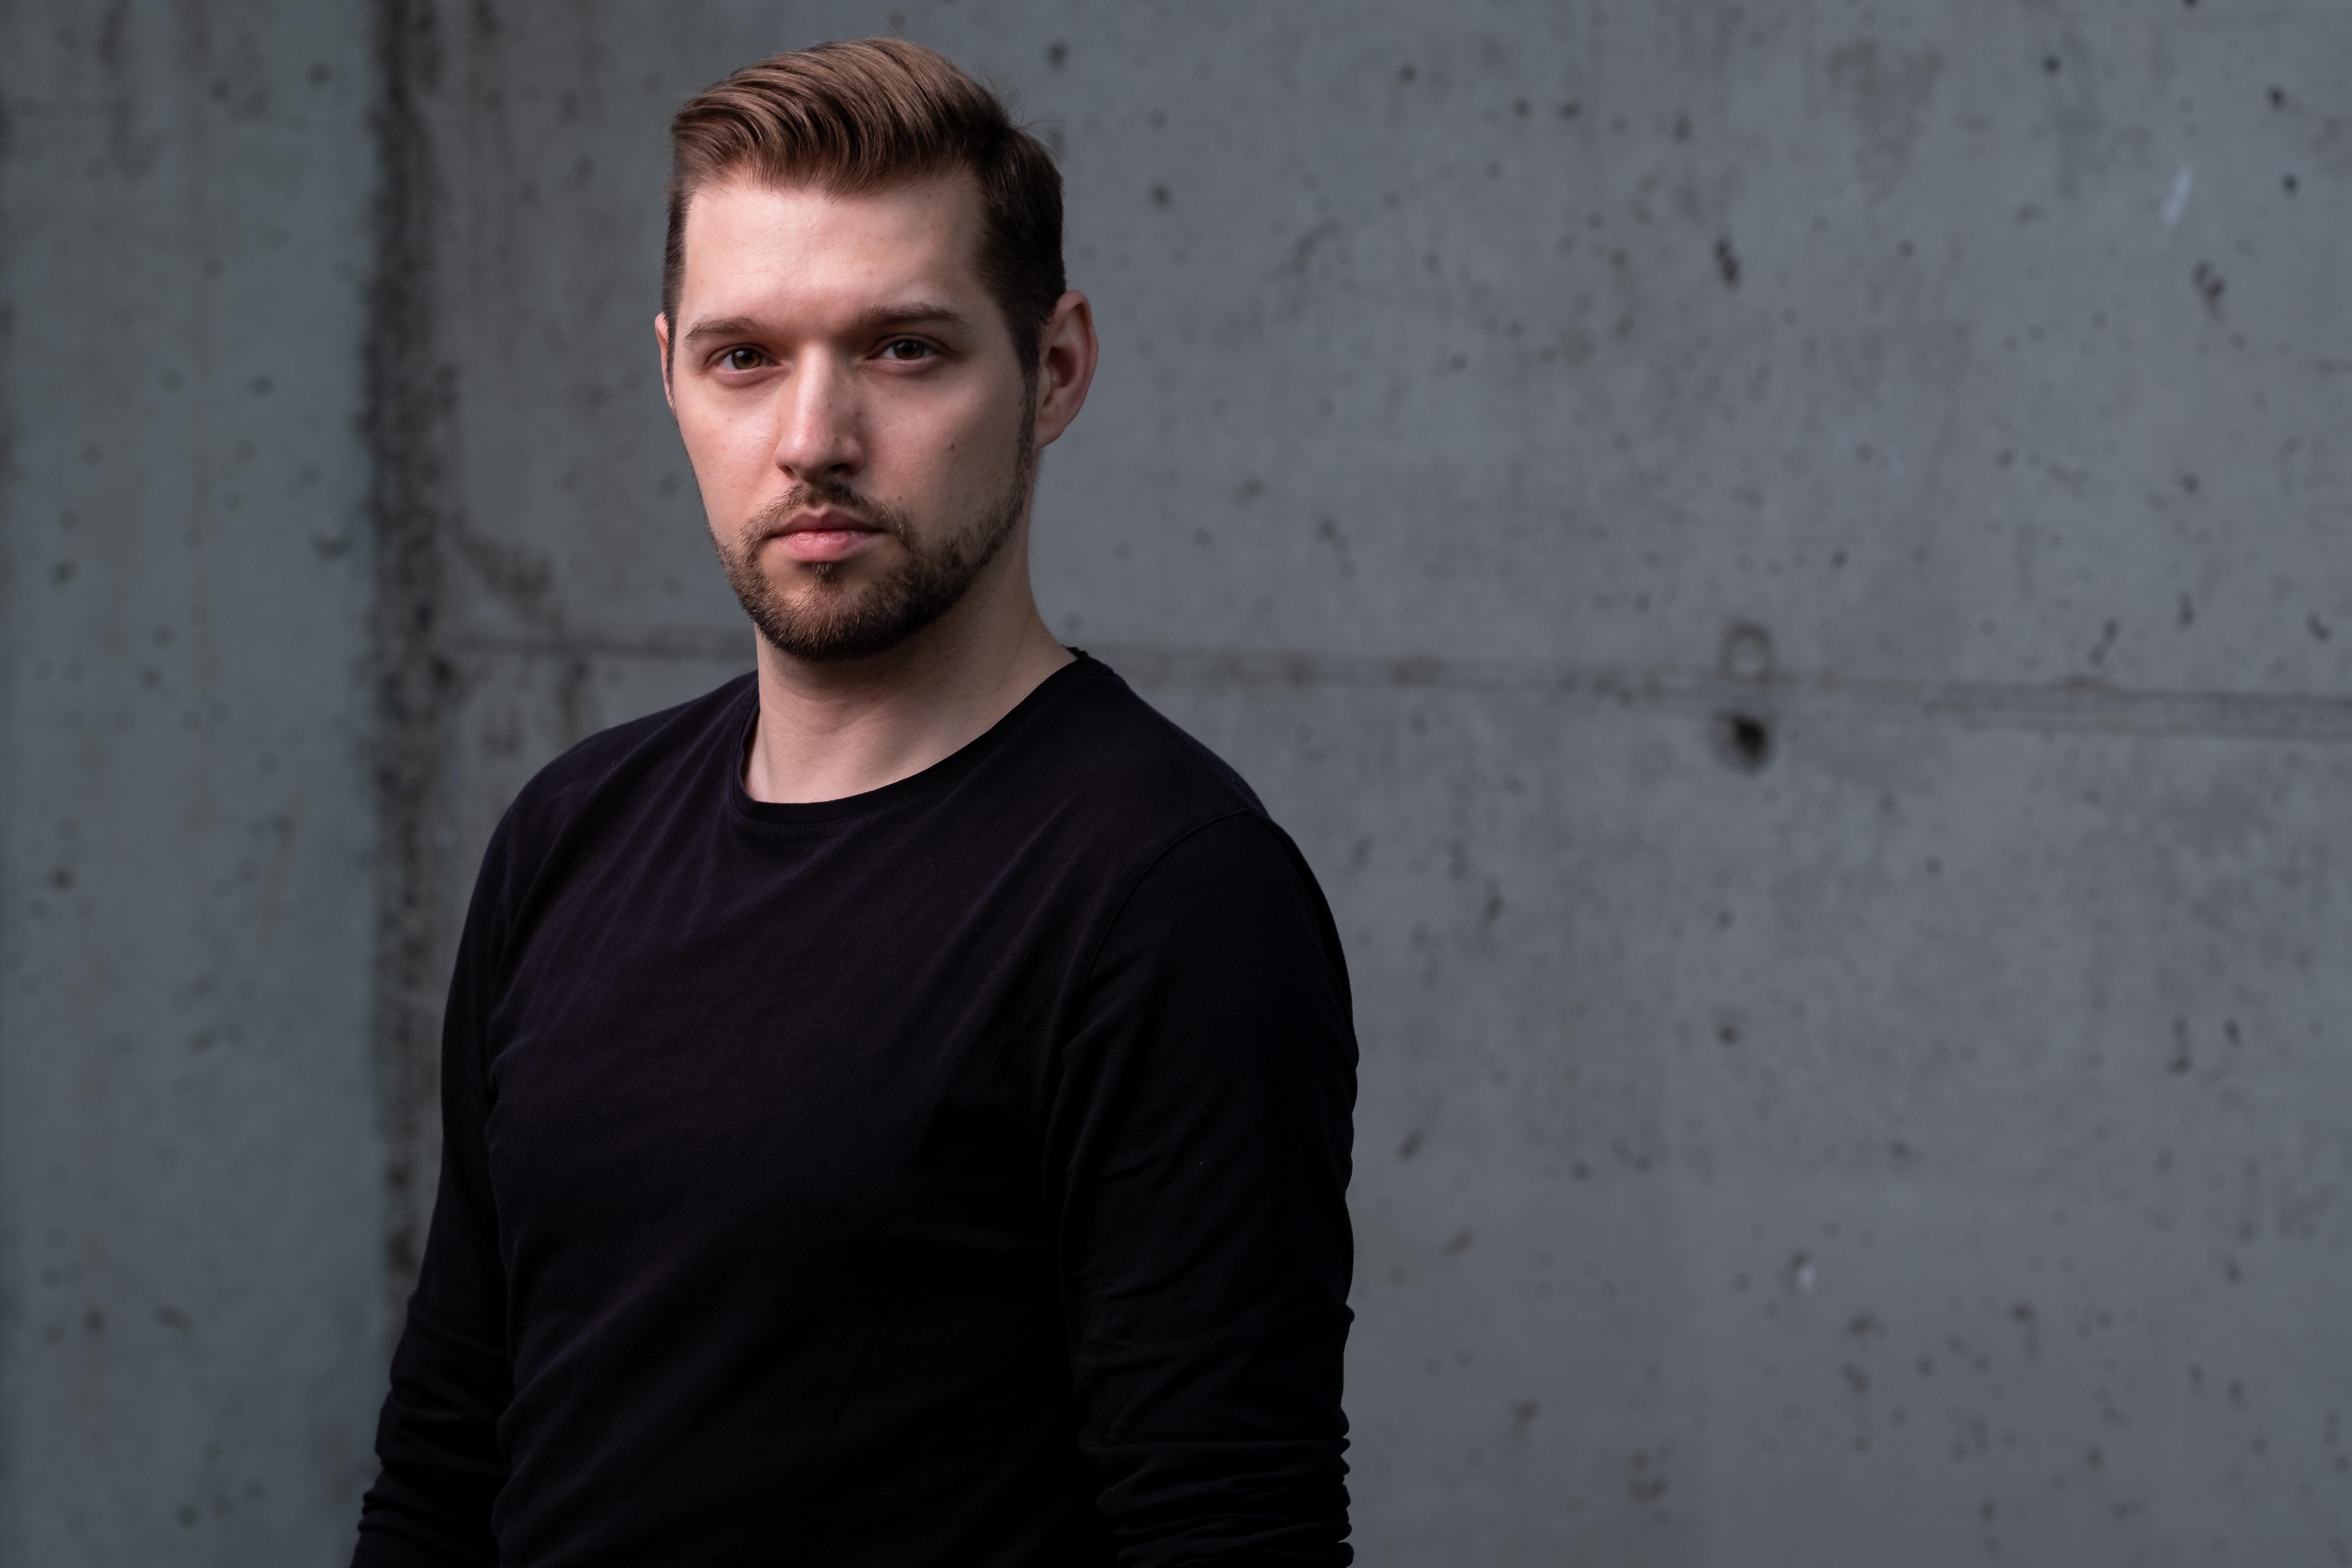 Fot. Marcin Watemborski